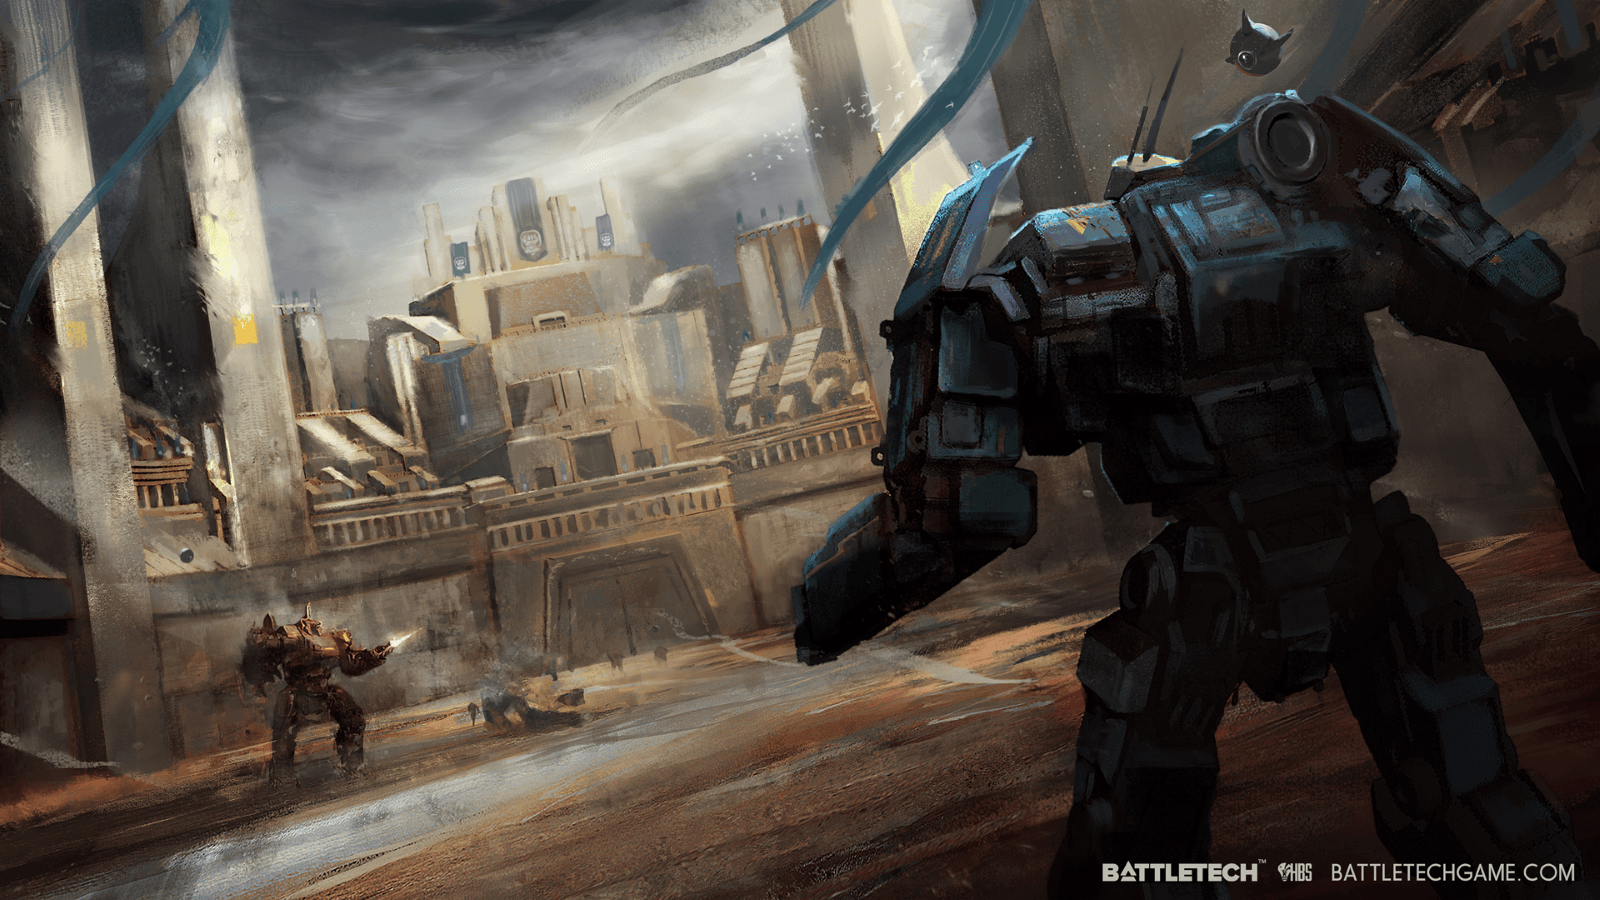 BattleTech Hits $2.5M and Unlocks PVP Multiplayer video thumbnail